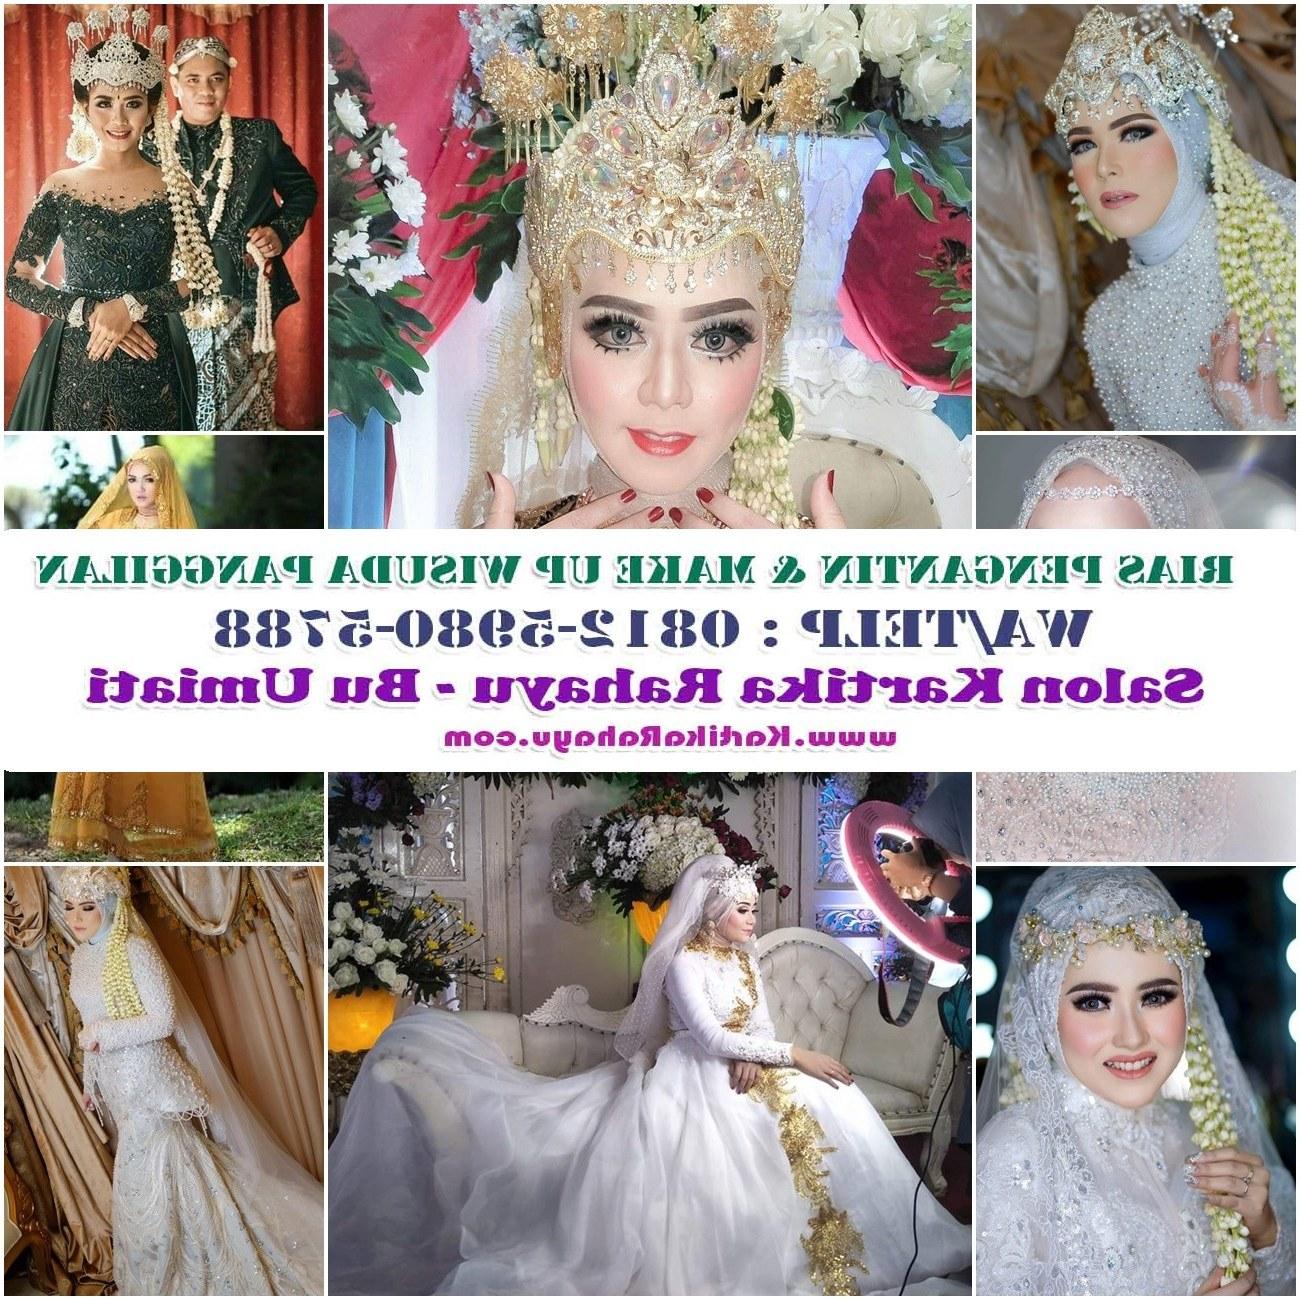 Model Sewa Baju Pengantin Muslimah Tangerang Zwdg Make Up Wisuda Malang Kota Malang Jawa Timur